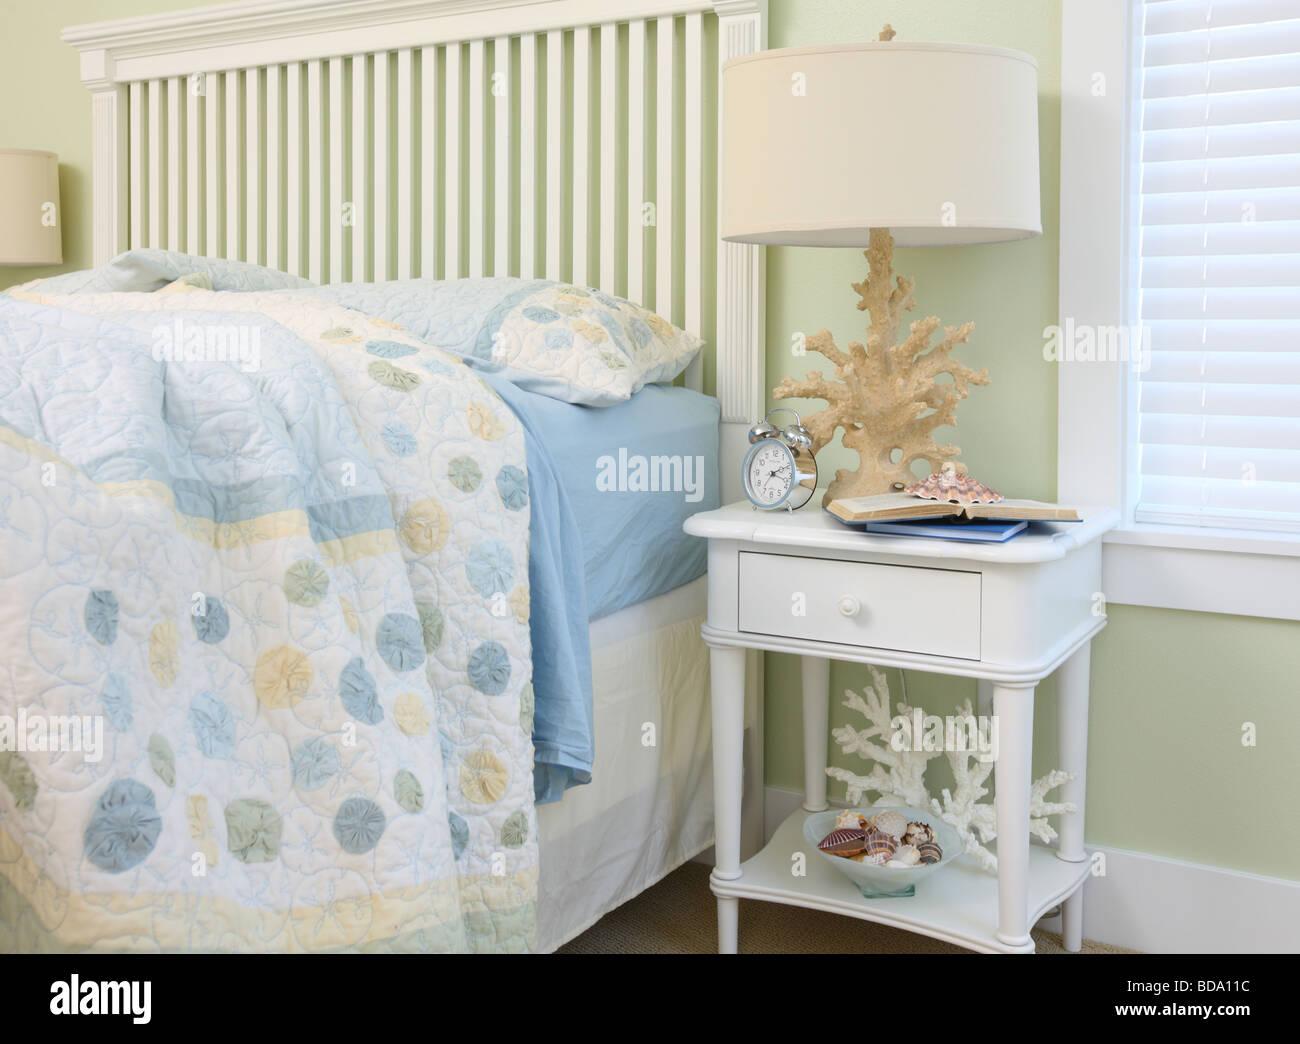 Beach house bedroom interior - Stock Image